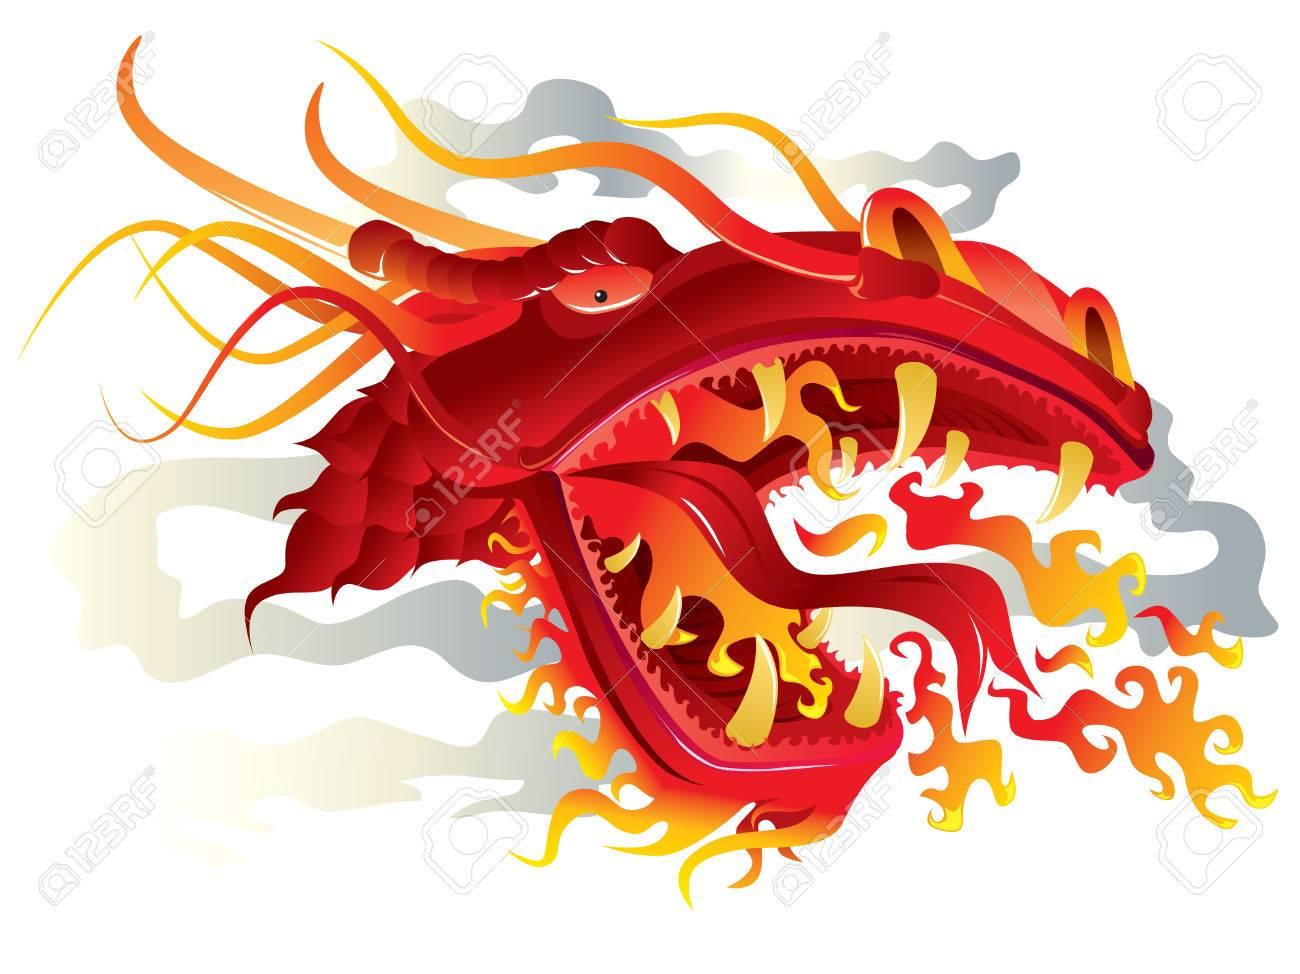 5 134 dragon head cliparts stock vector and royalty free dragon